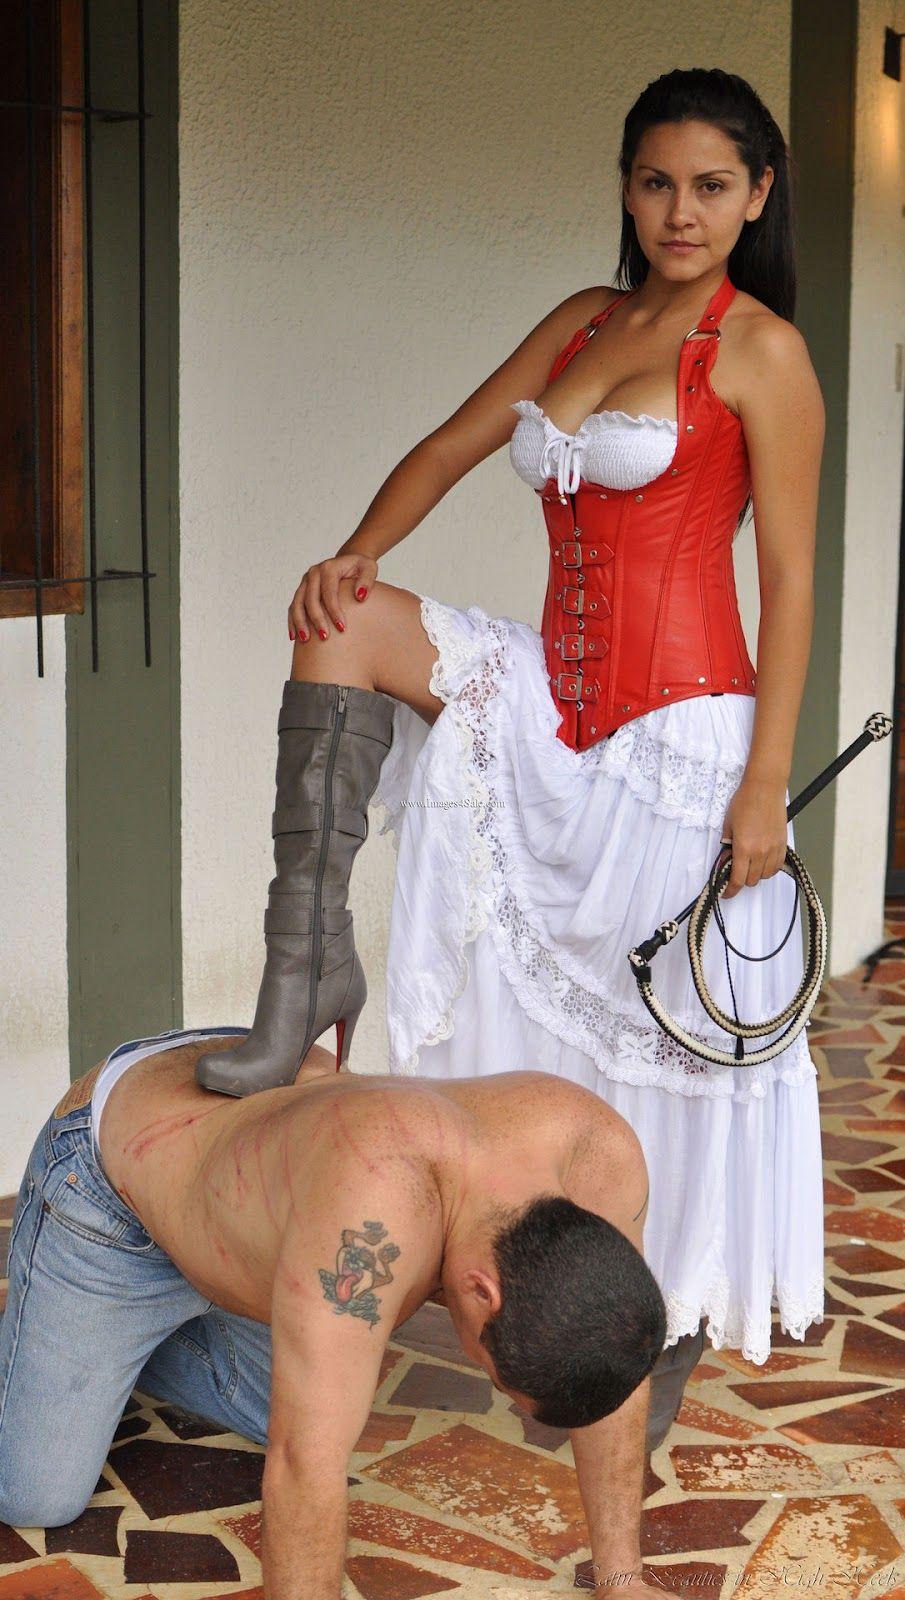 Femdom wives photos